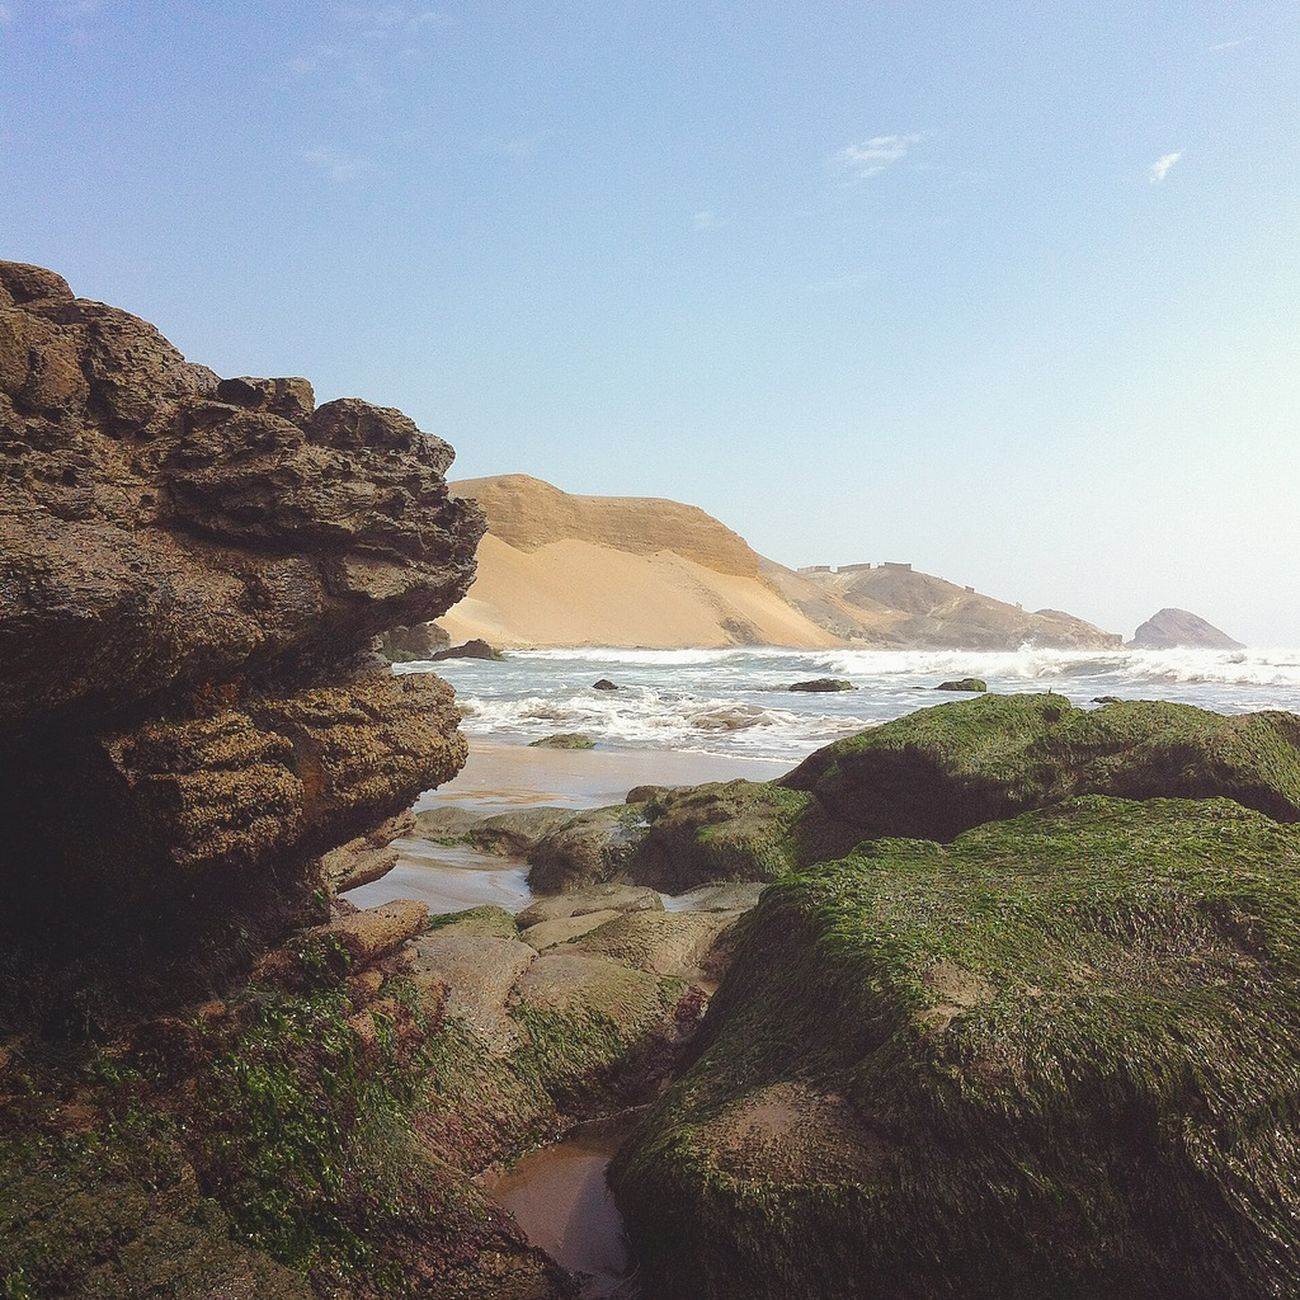 Being A Beach Bum Greettheoutdoors Trip Surfing Naturelovers Beach Prespective